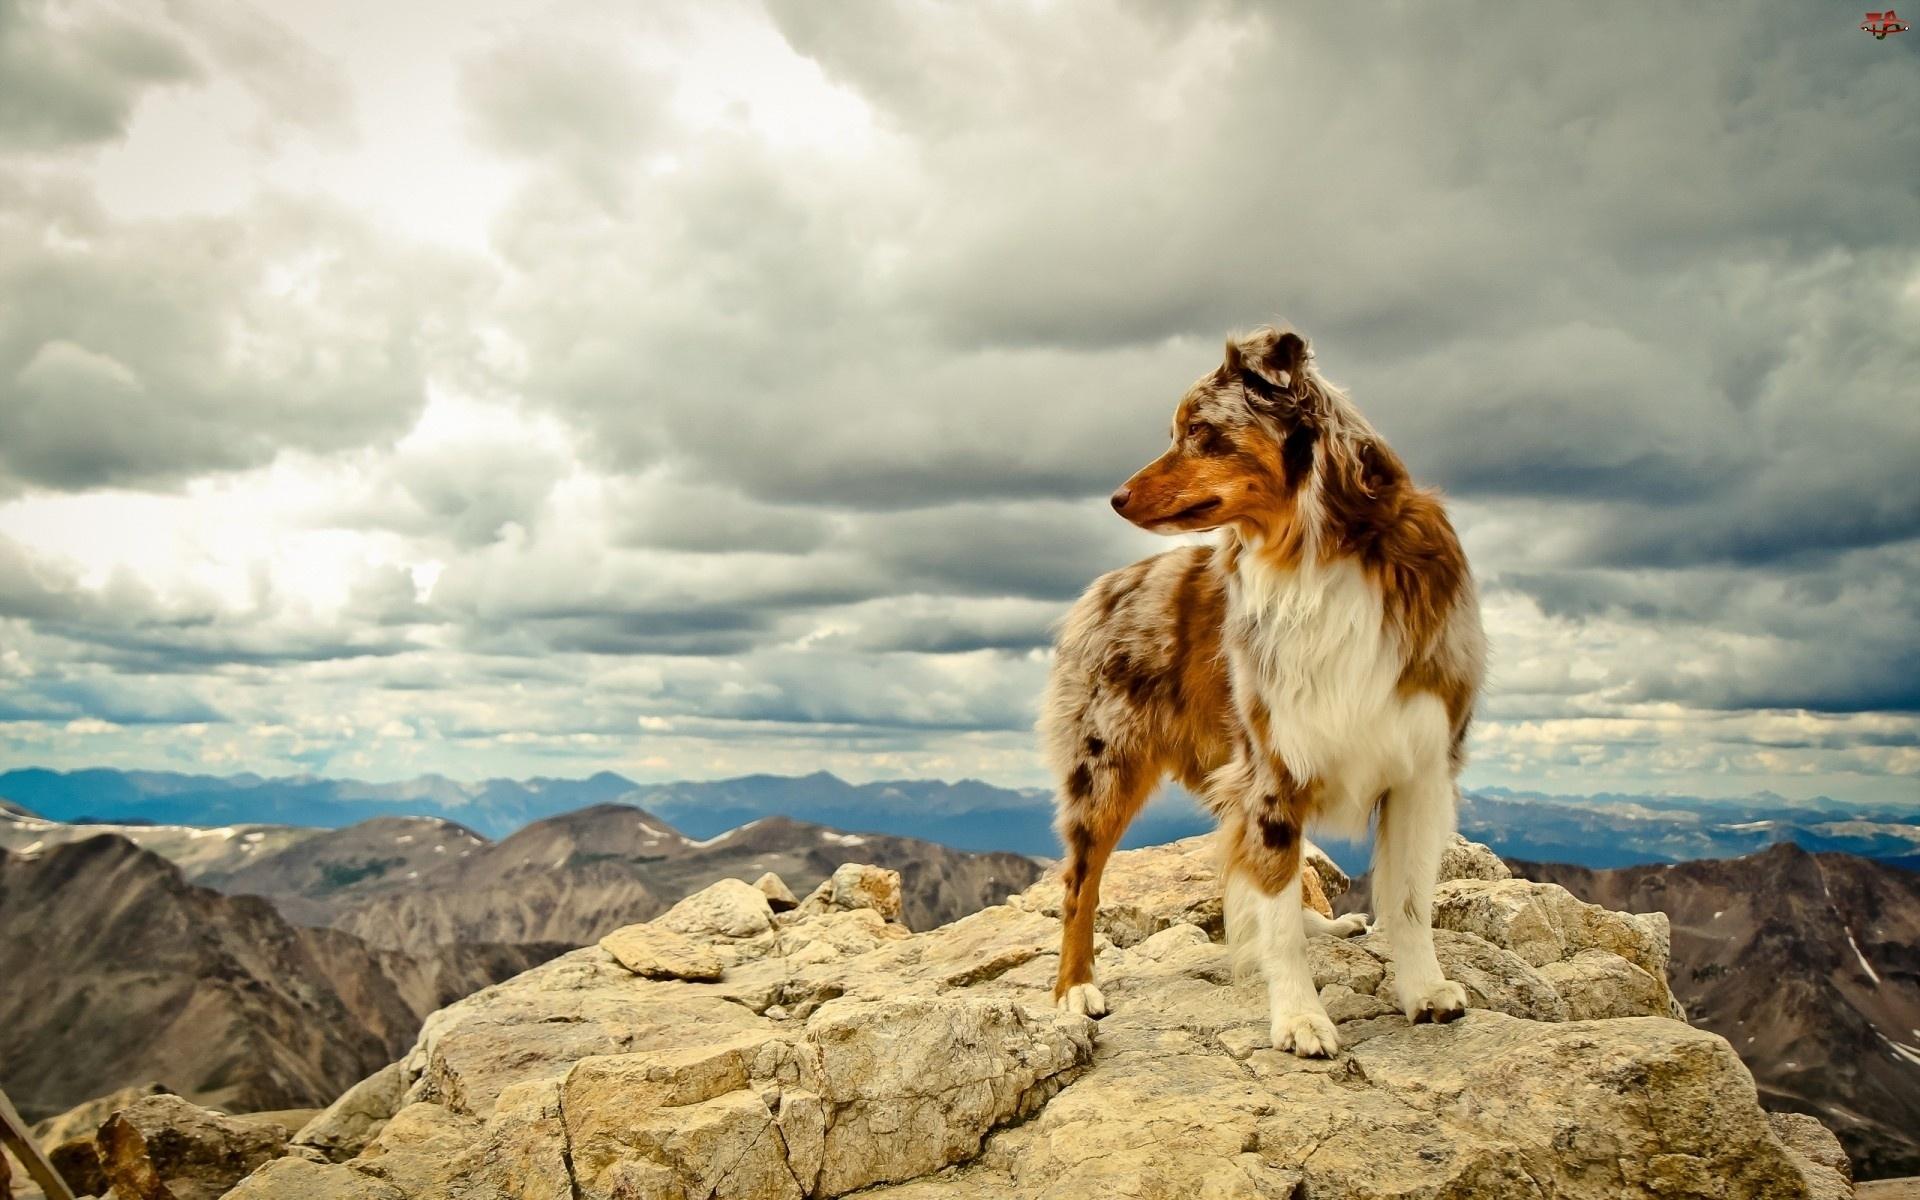 Góry, pies pasterski, Niebo, Australijski